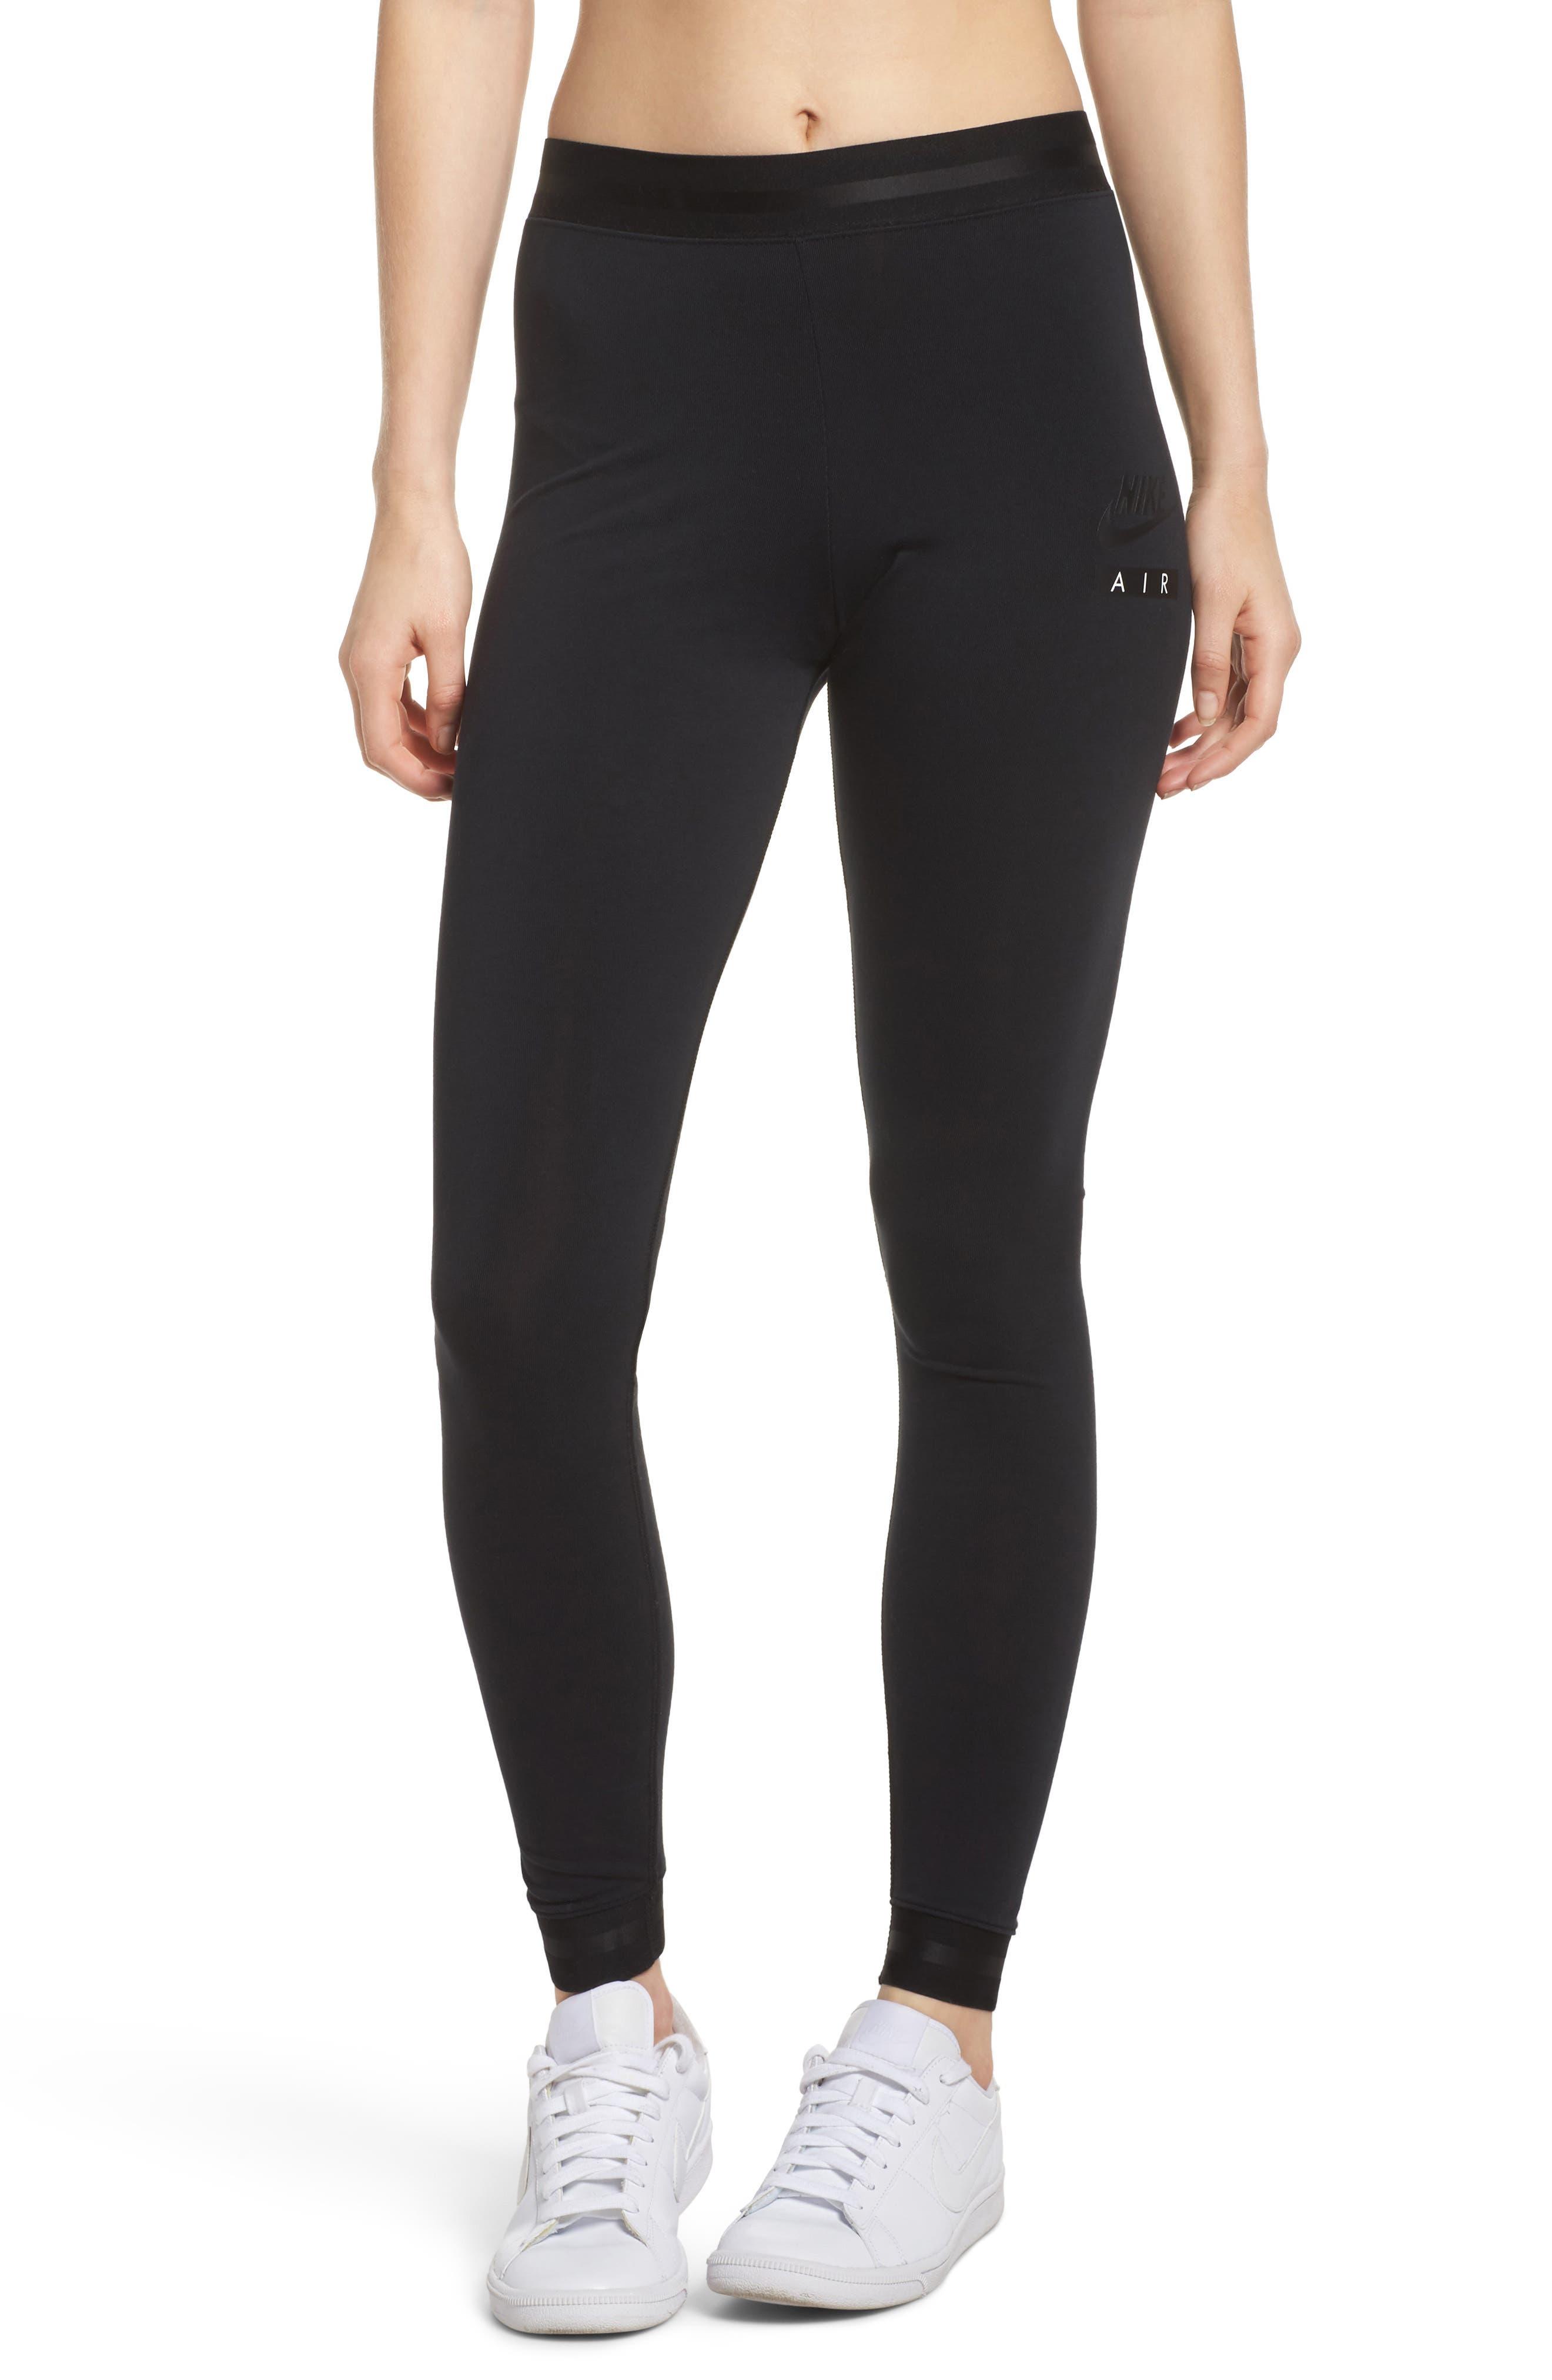 Sportswear Women's Leggings,                             Main thumbnail 1, color,                             Black/ Black/ Black